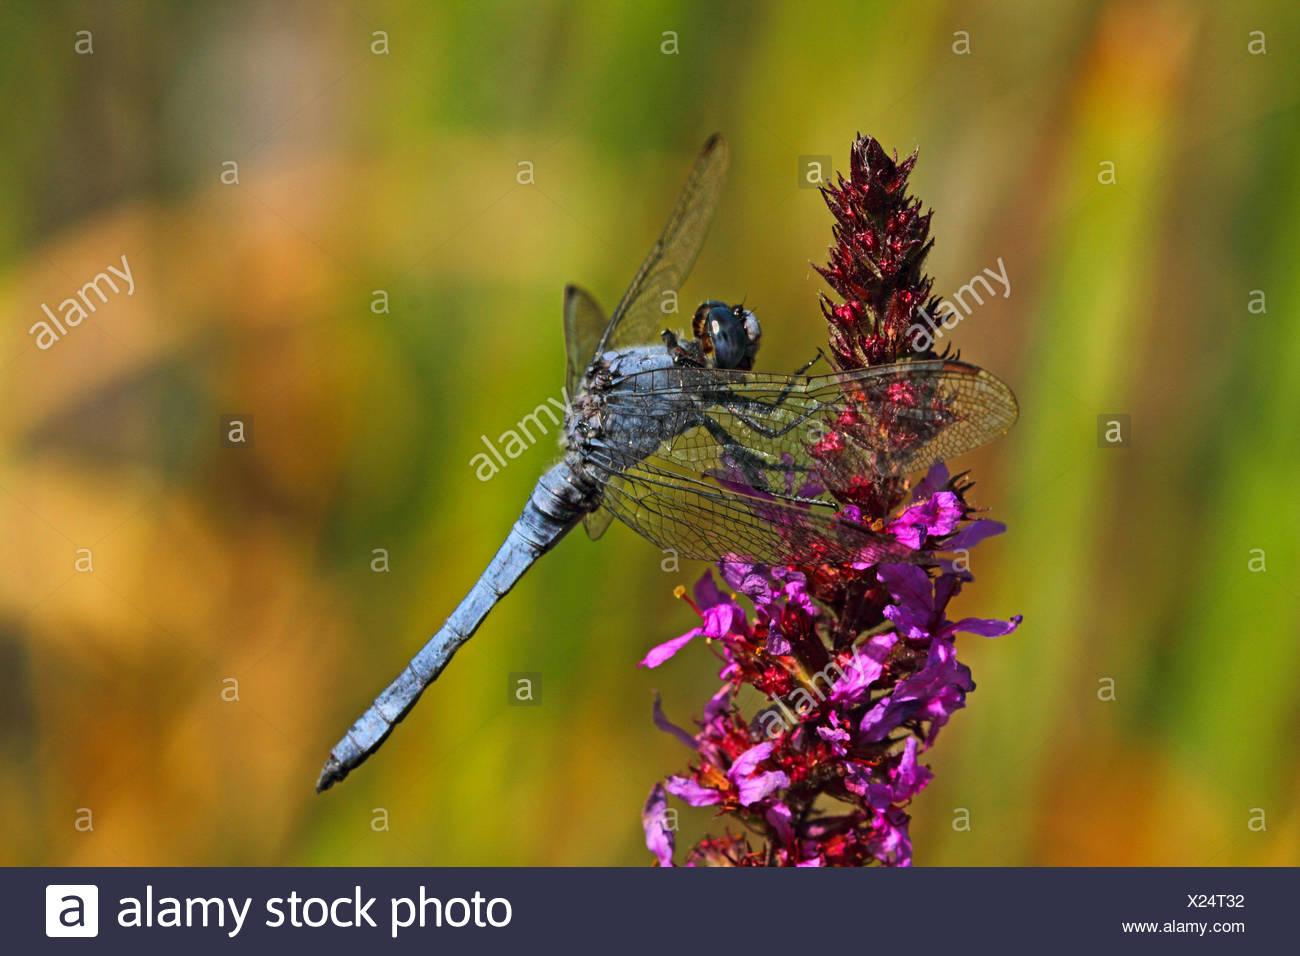 Europa meridionale (skimmer Orthetrum brunneum), maschio su purple loosestrife, Germania Immagini Stock